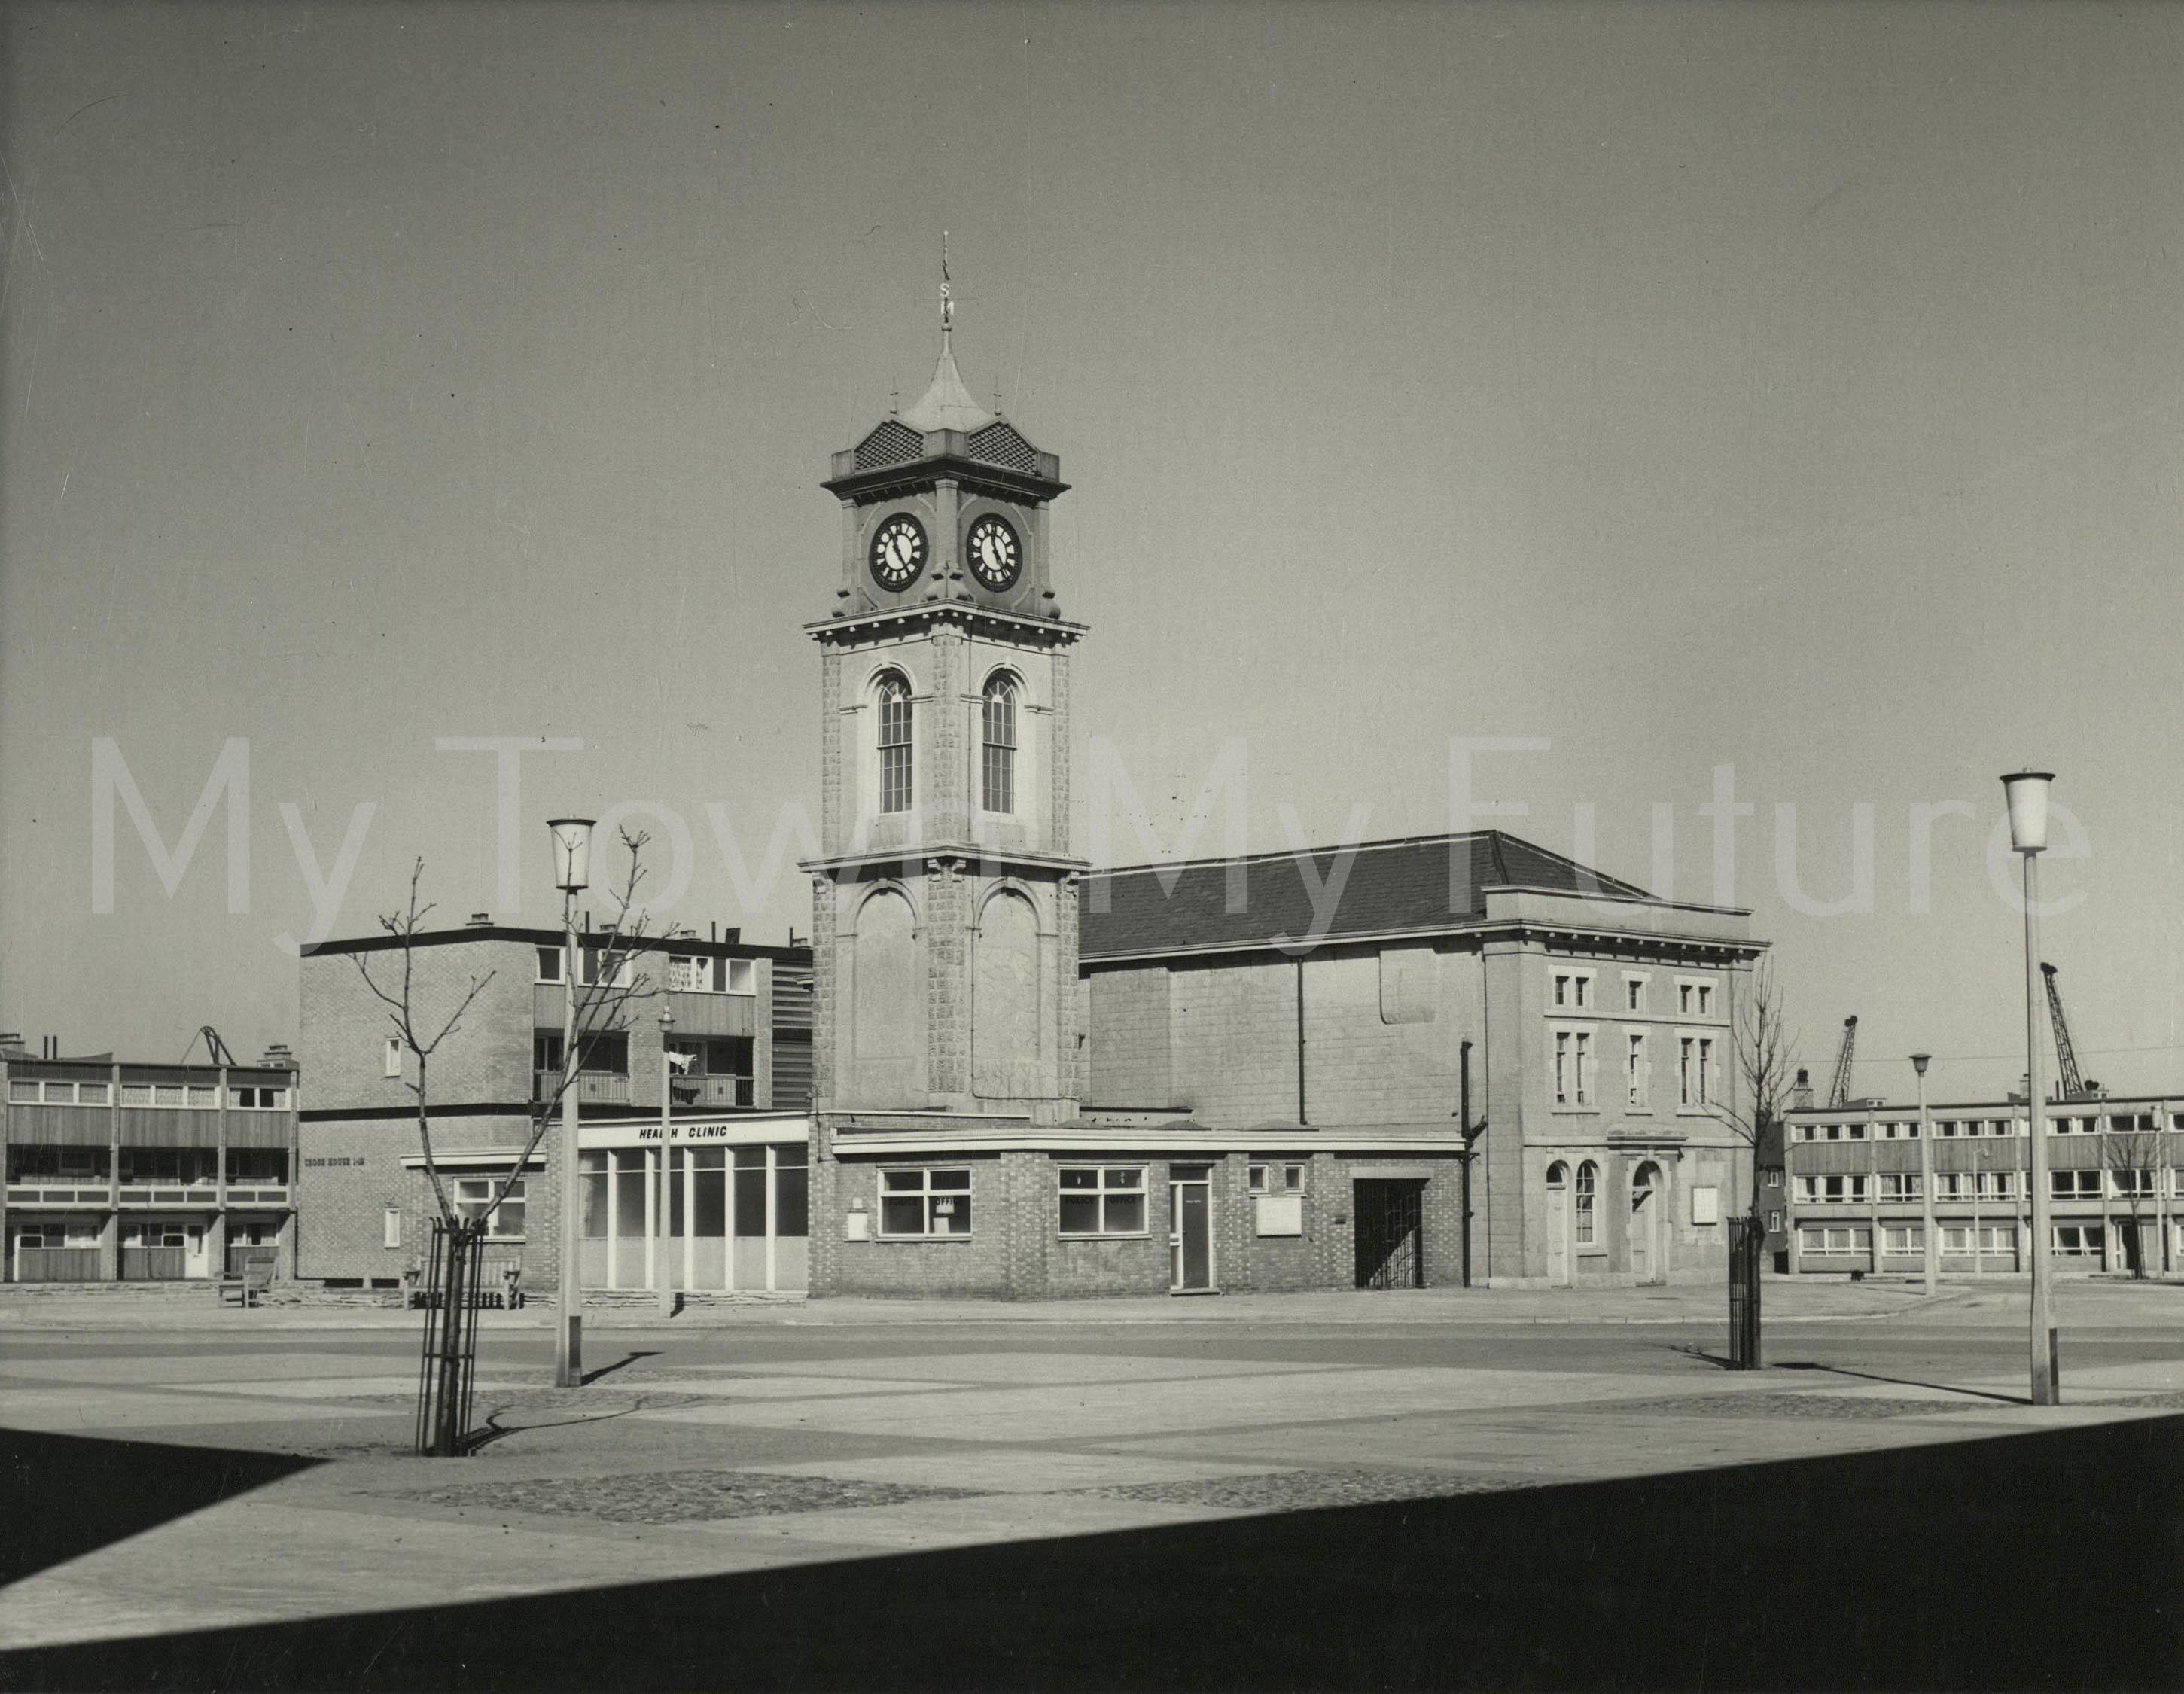 St Hilda's Market Place